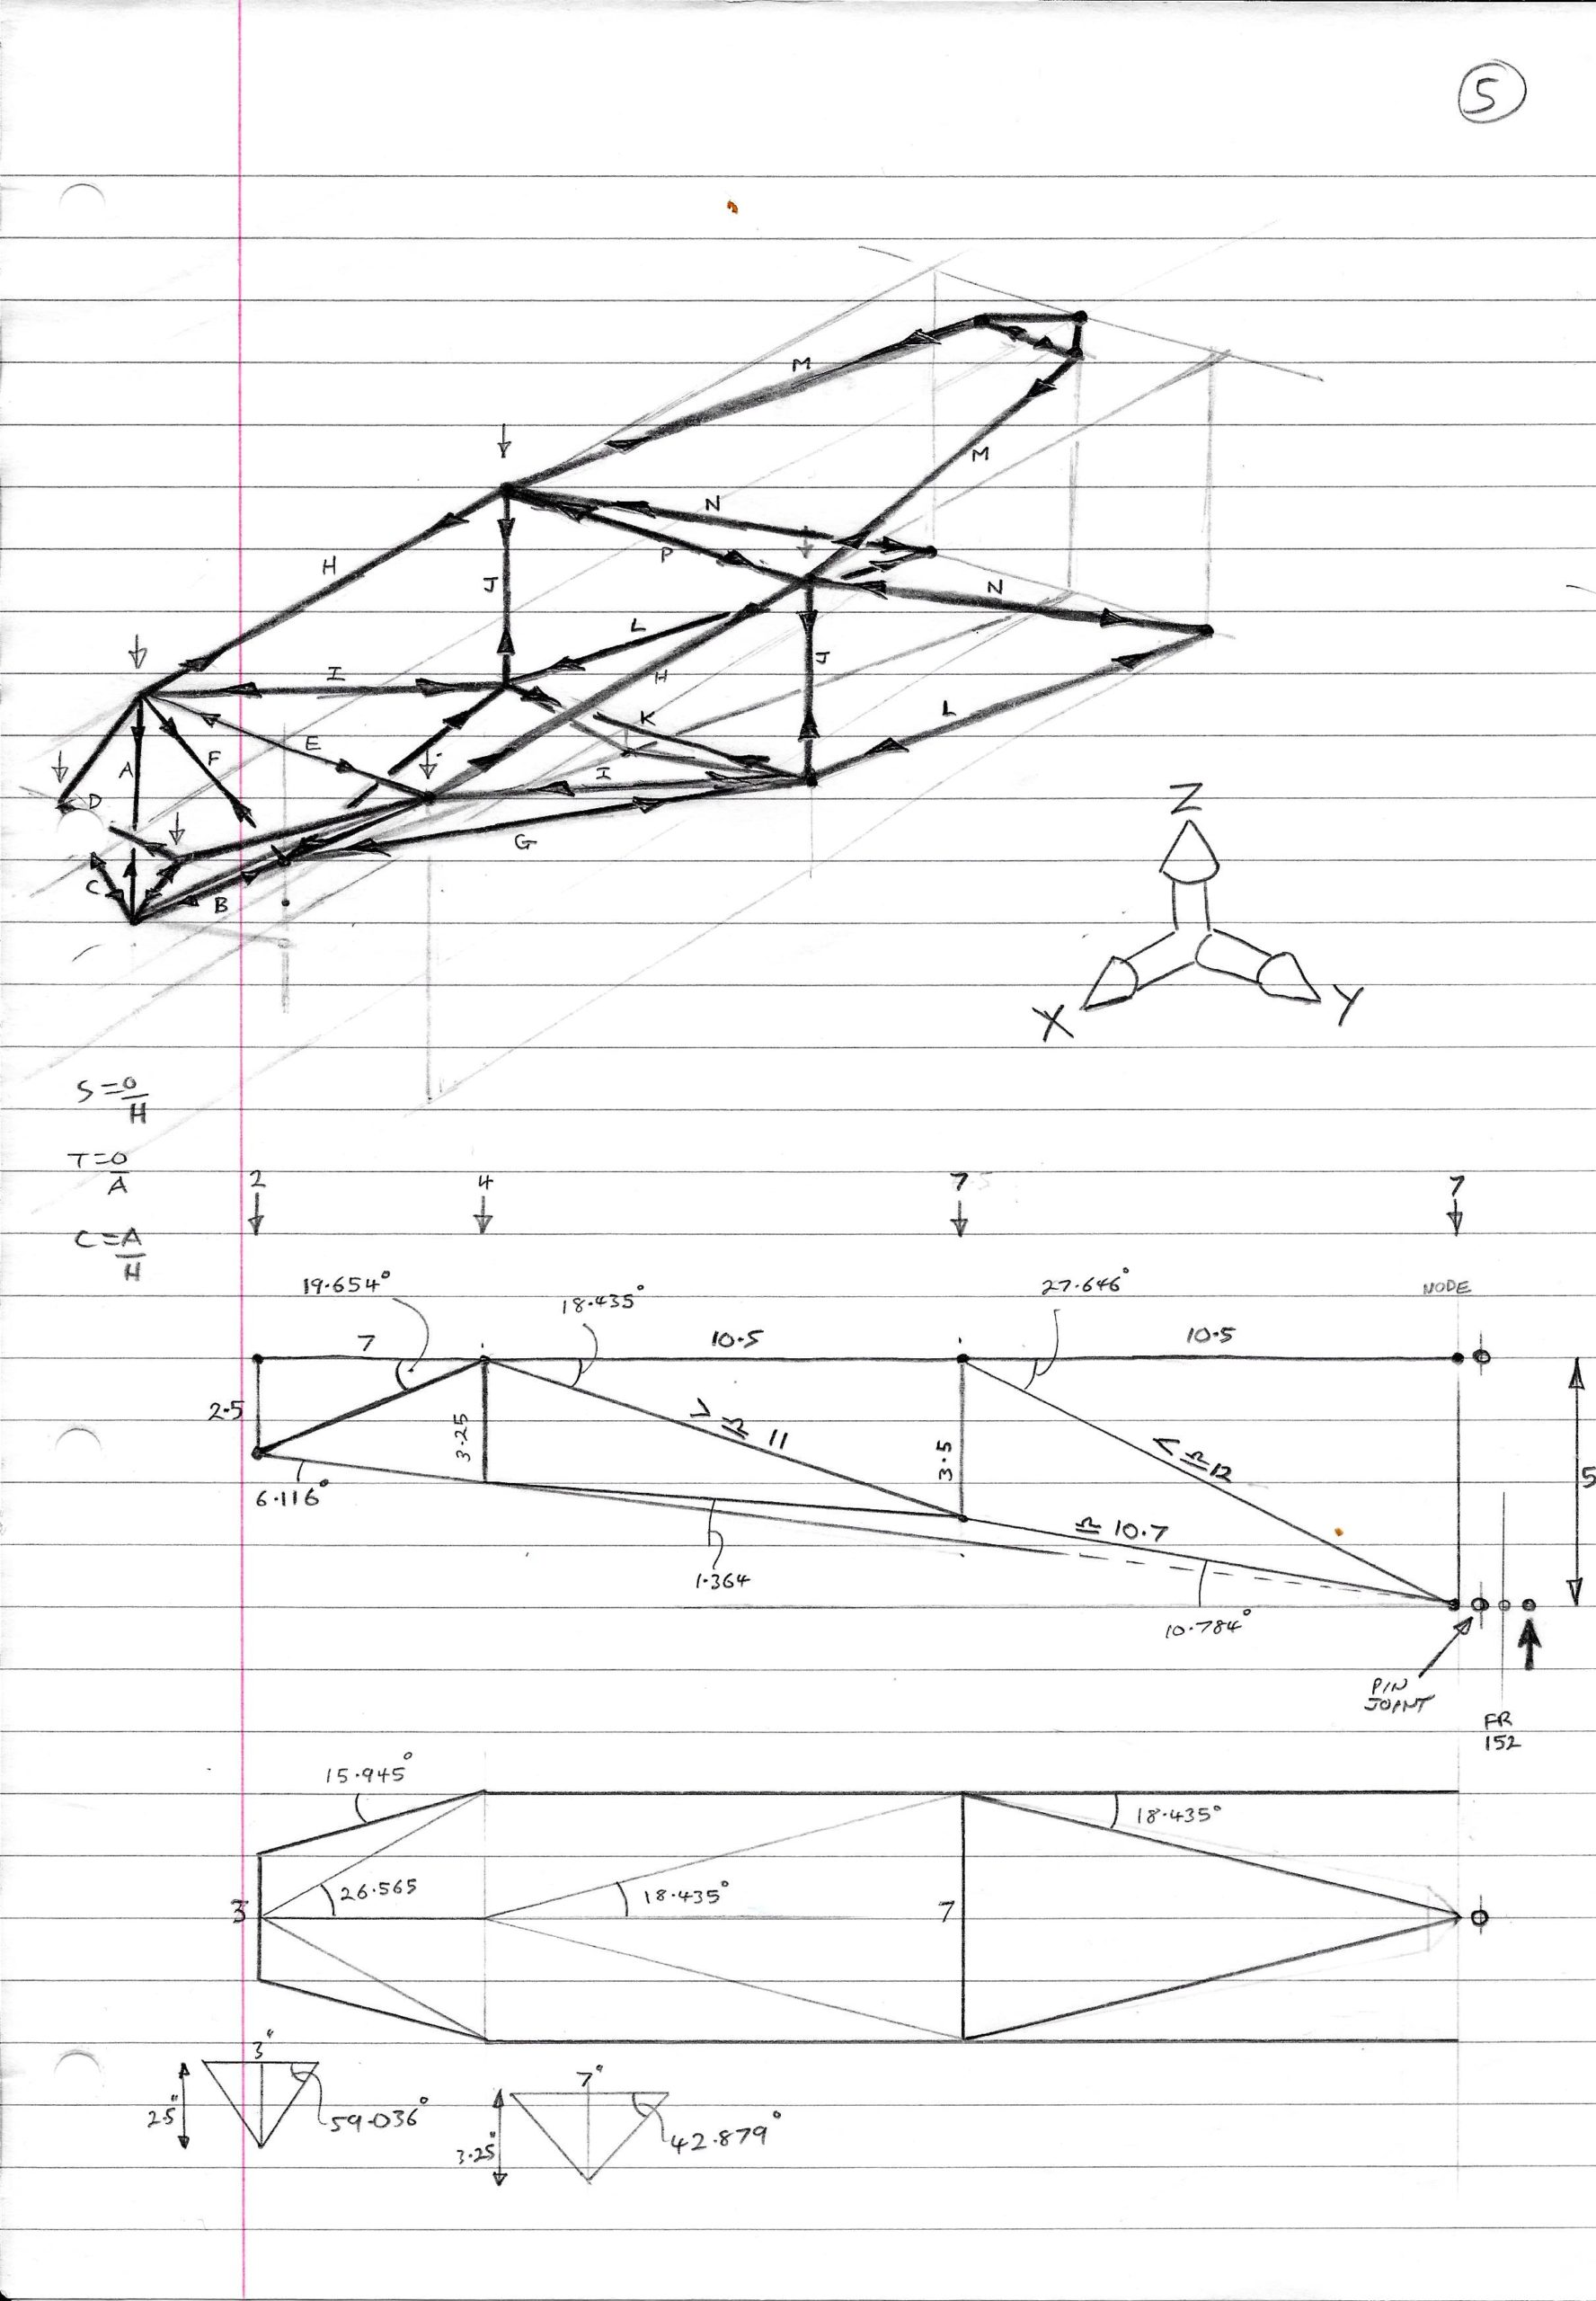 Stern structure diagram